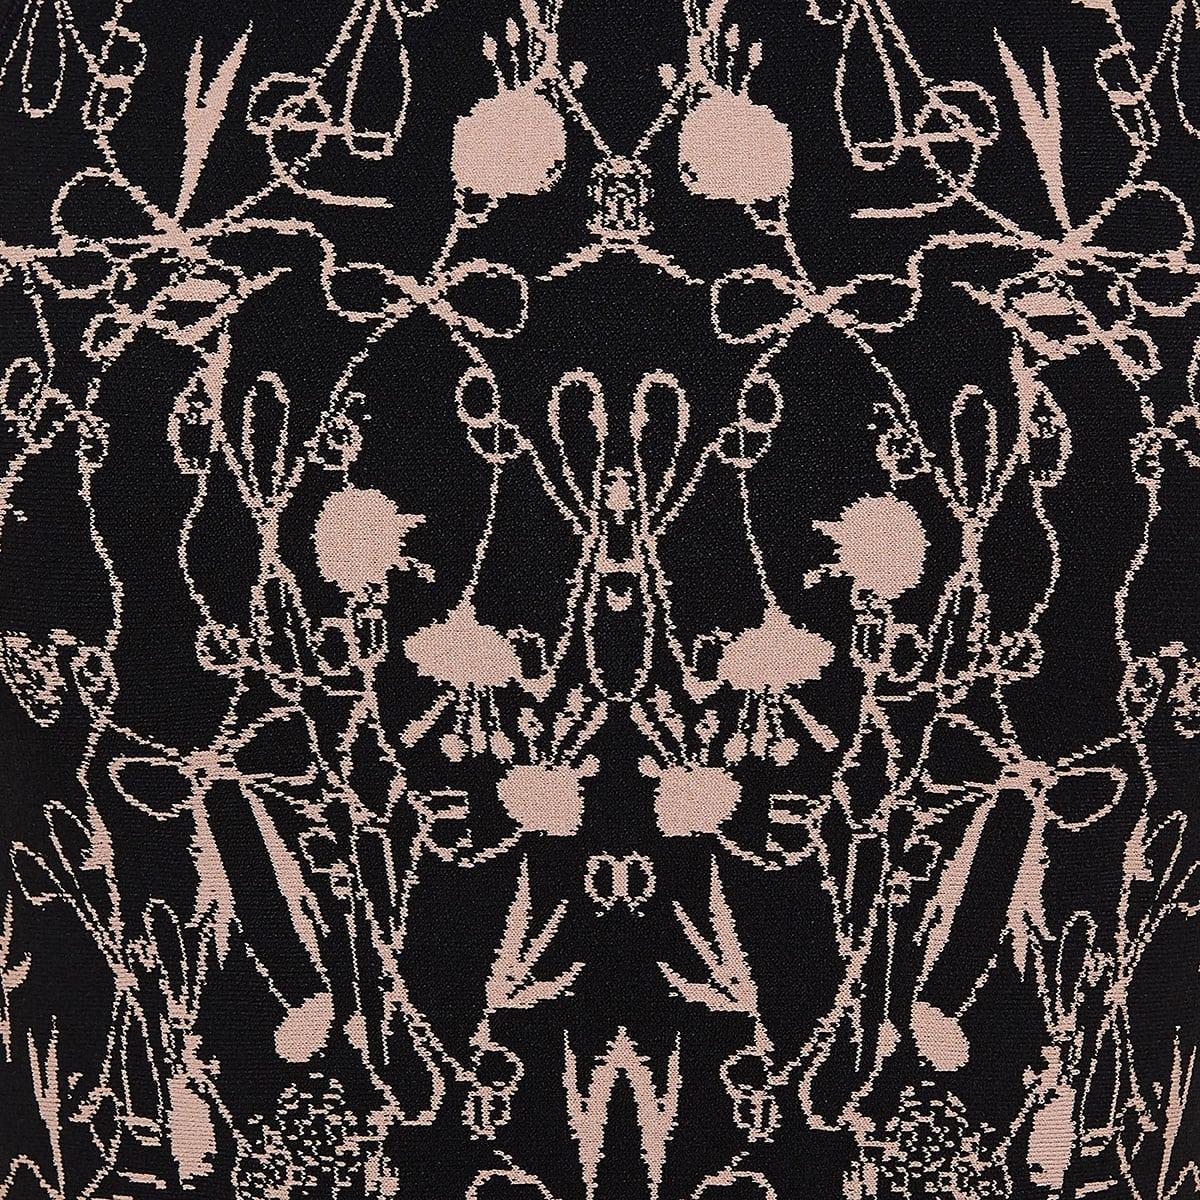 Jacquard-knitted mini dress